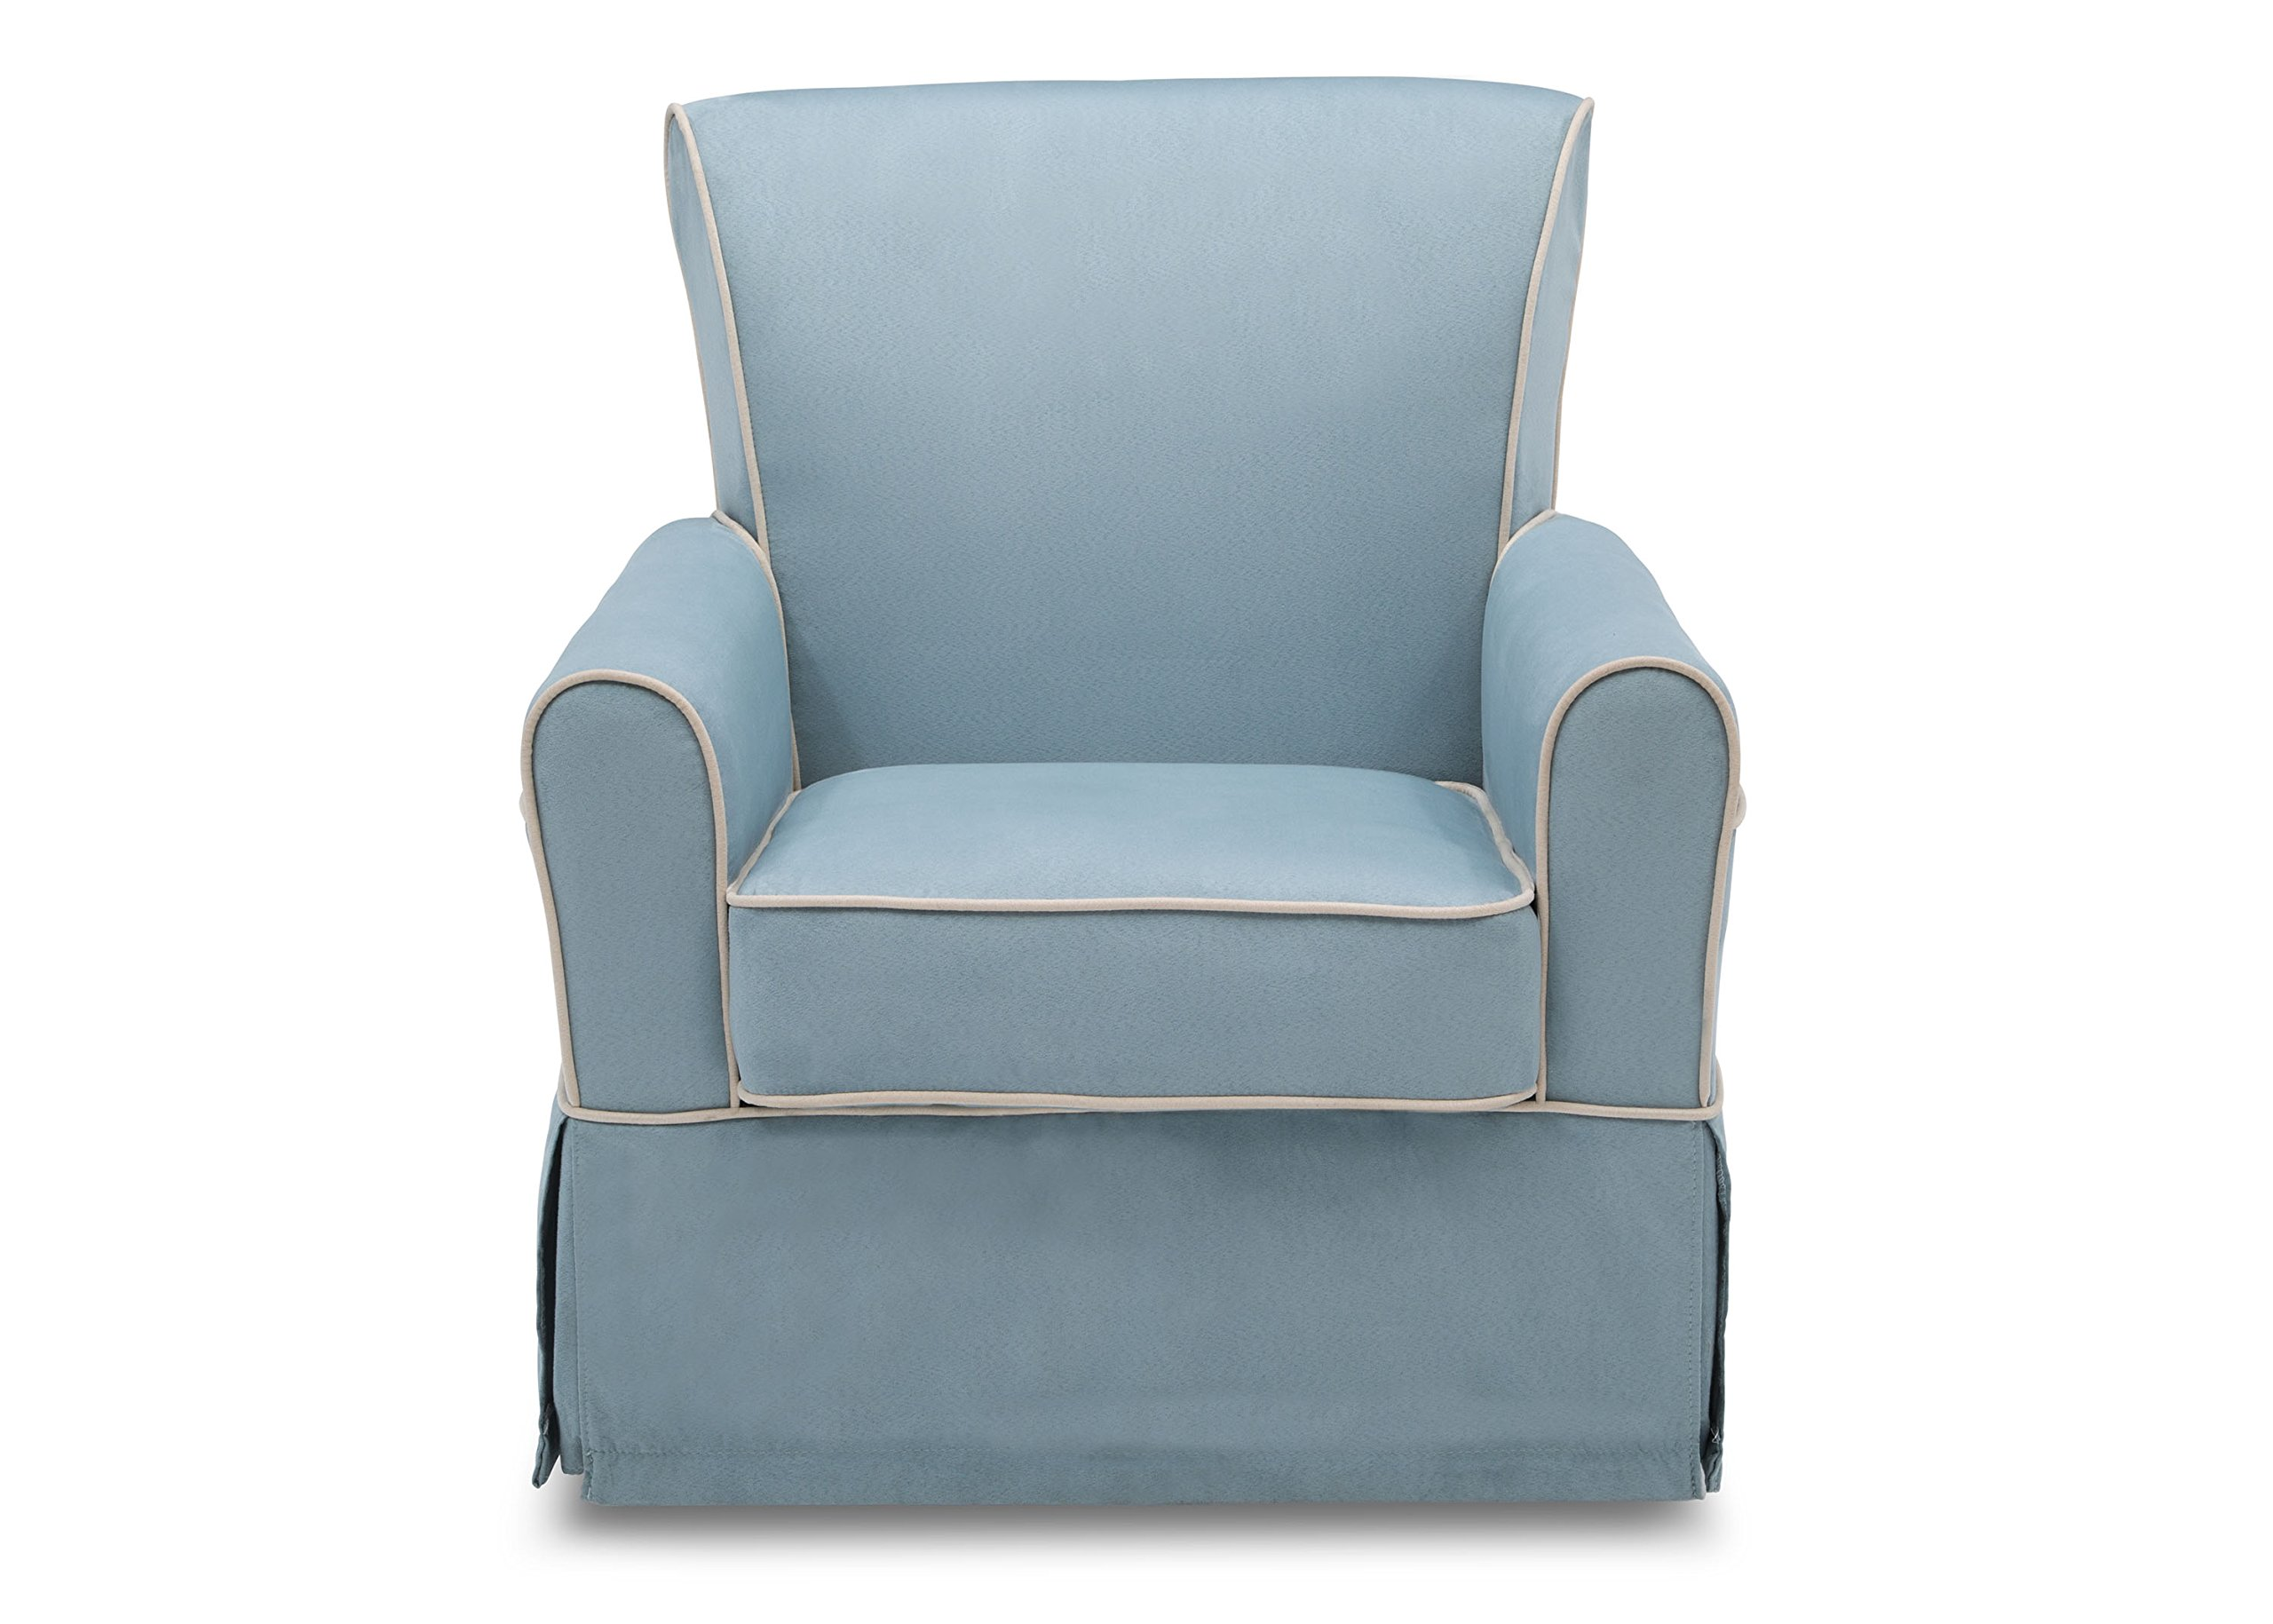 Delta Furniture Benbridge Upholstered Glider Swivel Rocker Chair, Frozen Blue with Cream Welt by Delta Furniture (Image #4)